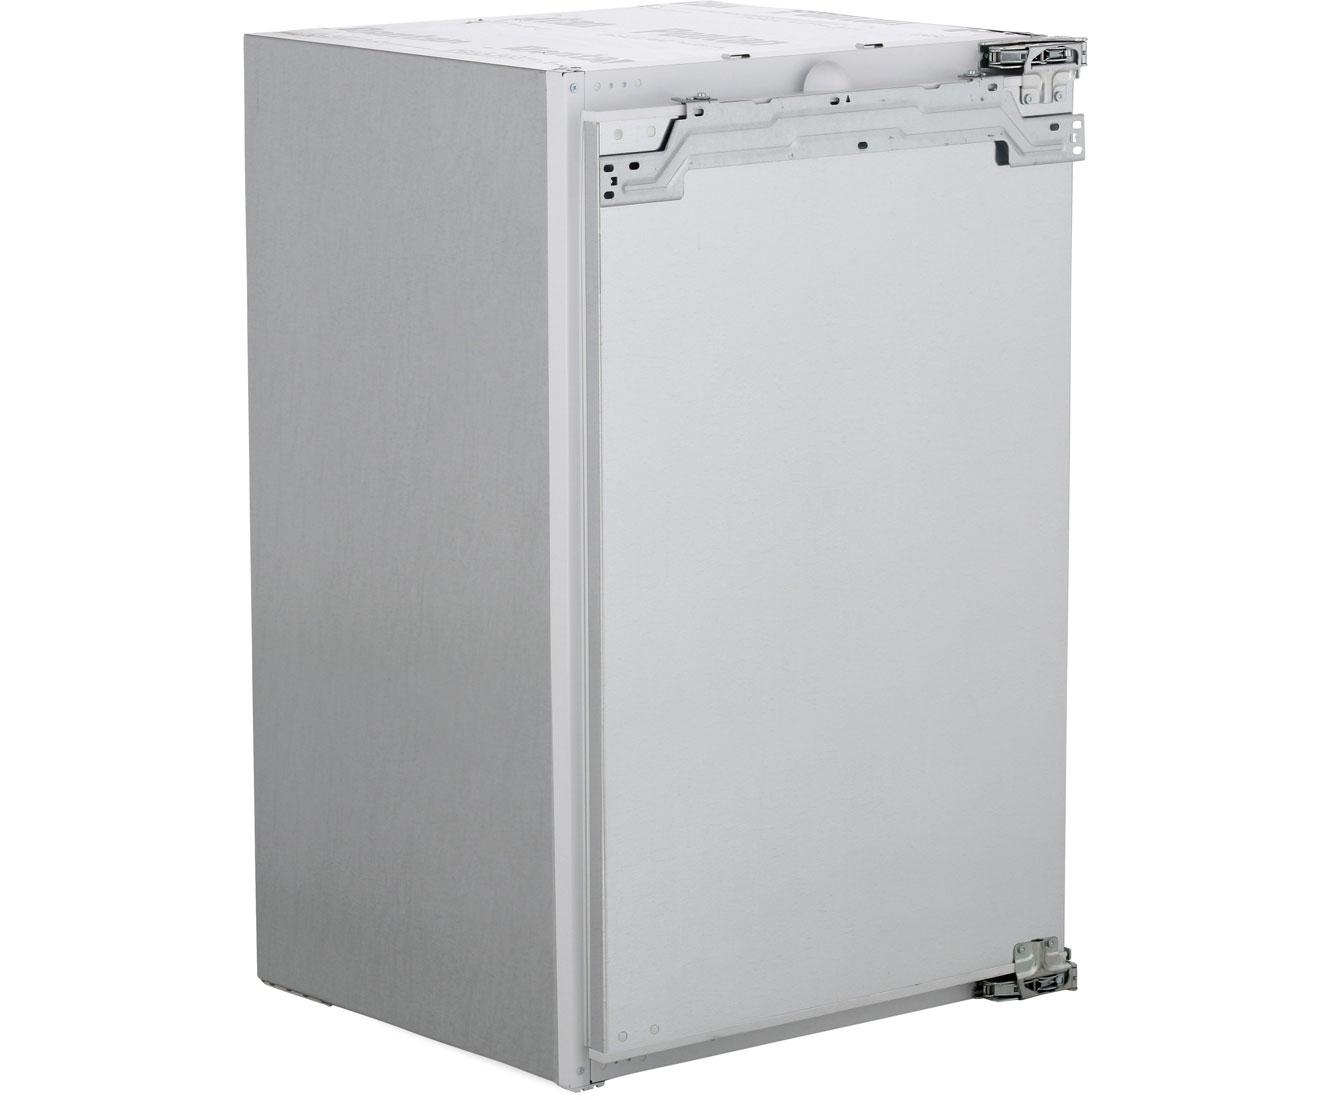 Bosch Kühlschrank Justieren : Bosch serie kir v einbau kühlschrank er nische festtür